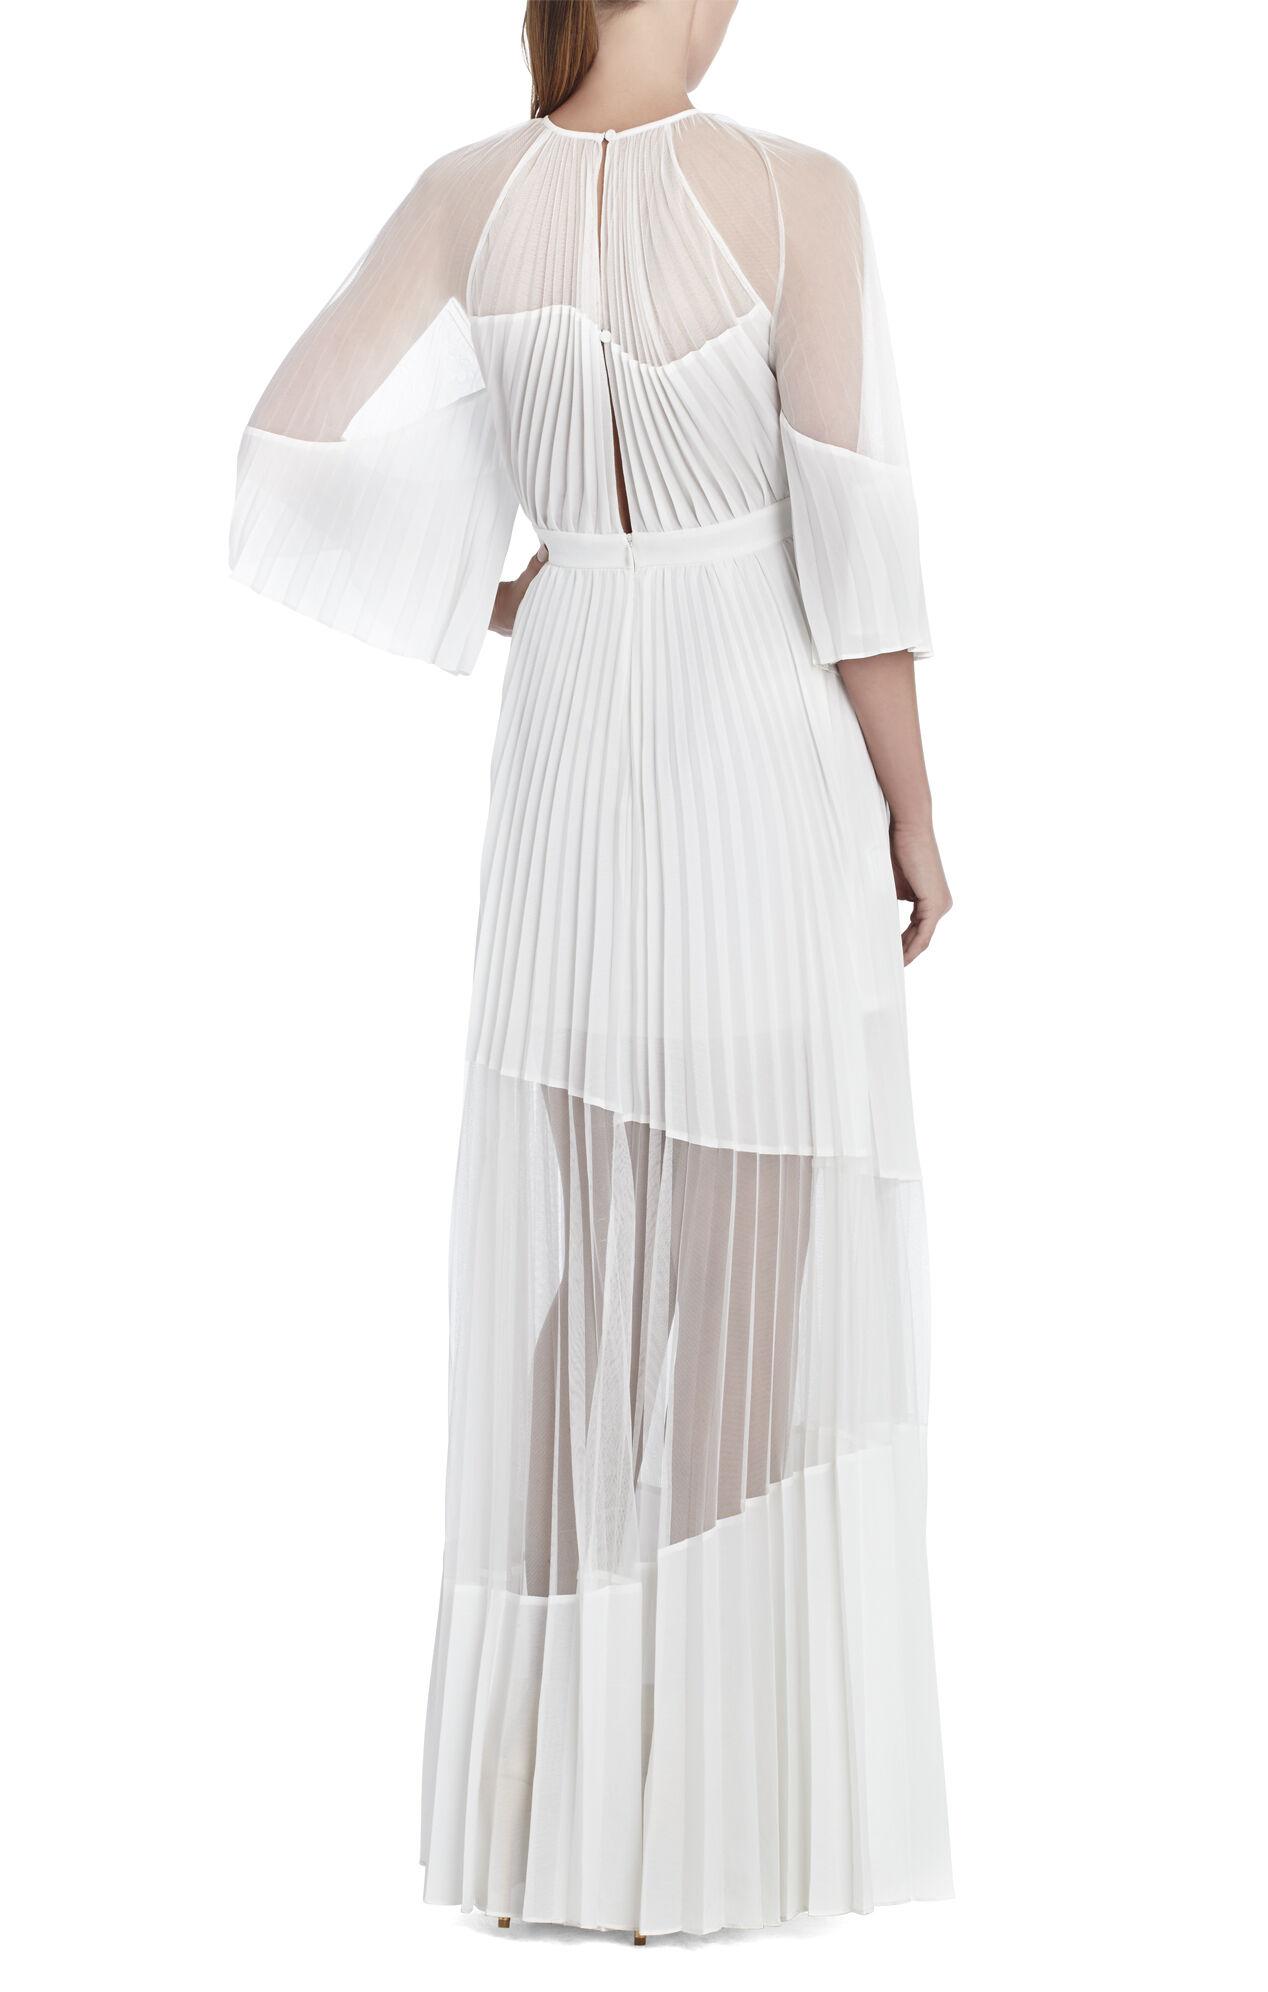 Riley Long Color-Blocked Sunburst-Pleat Dress